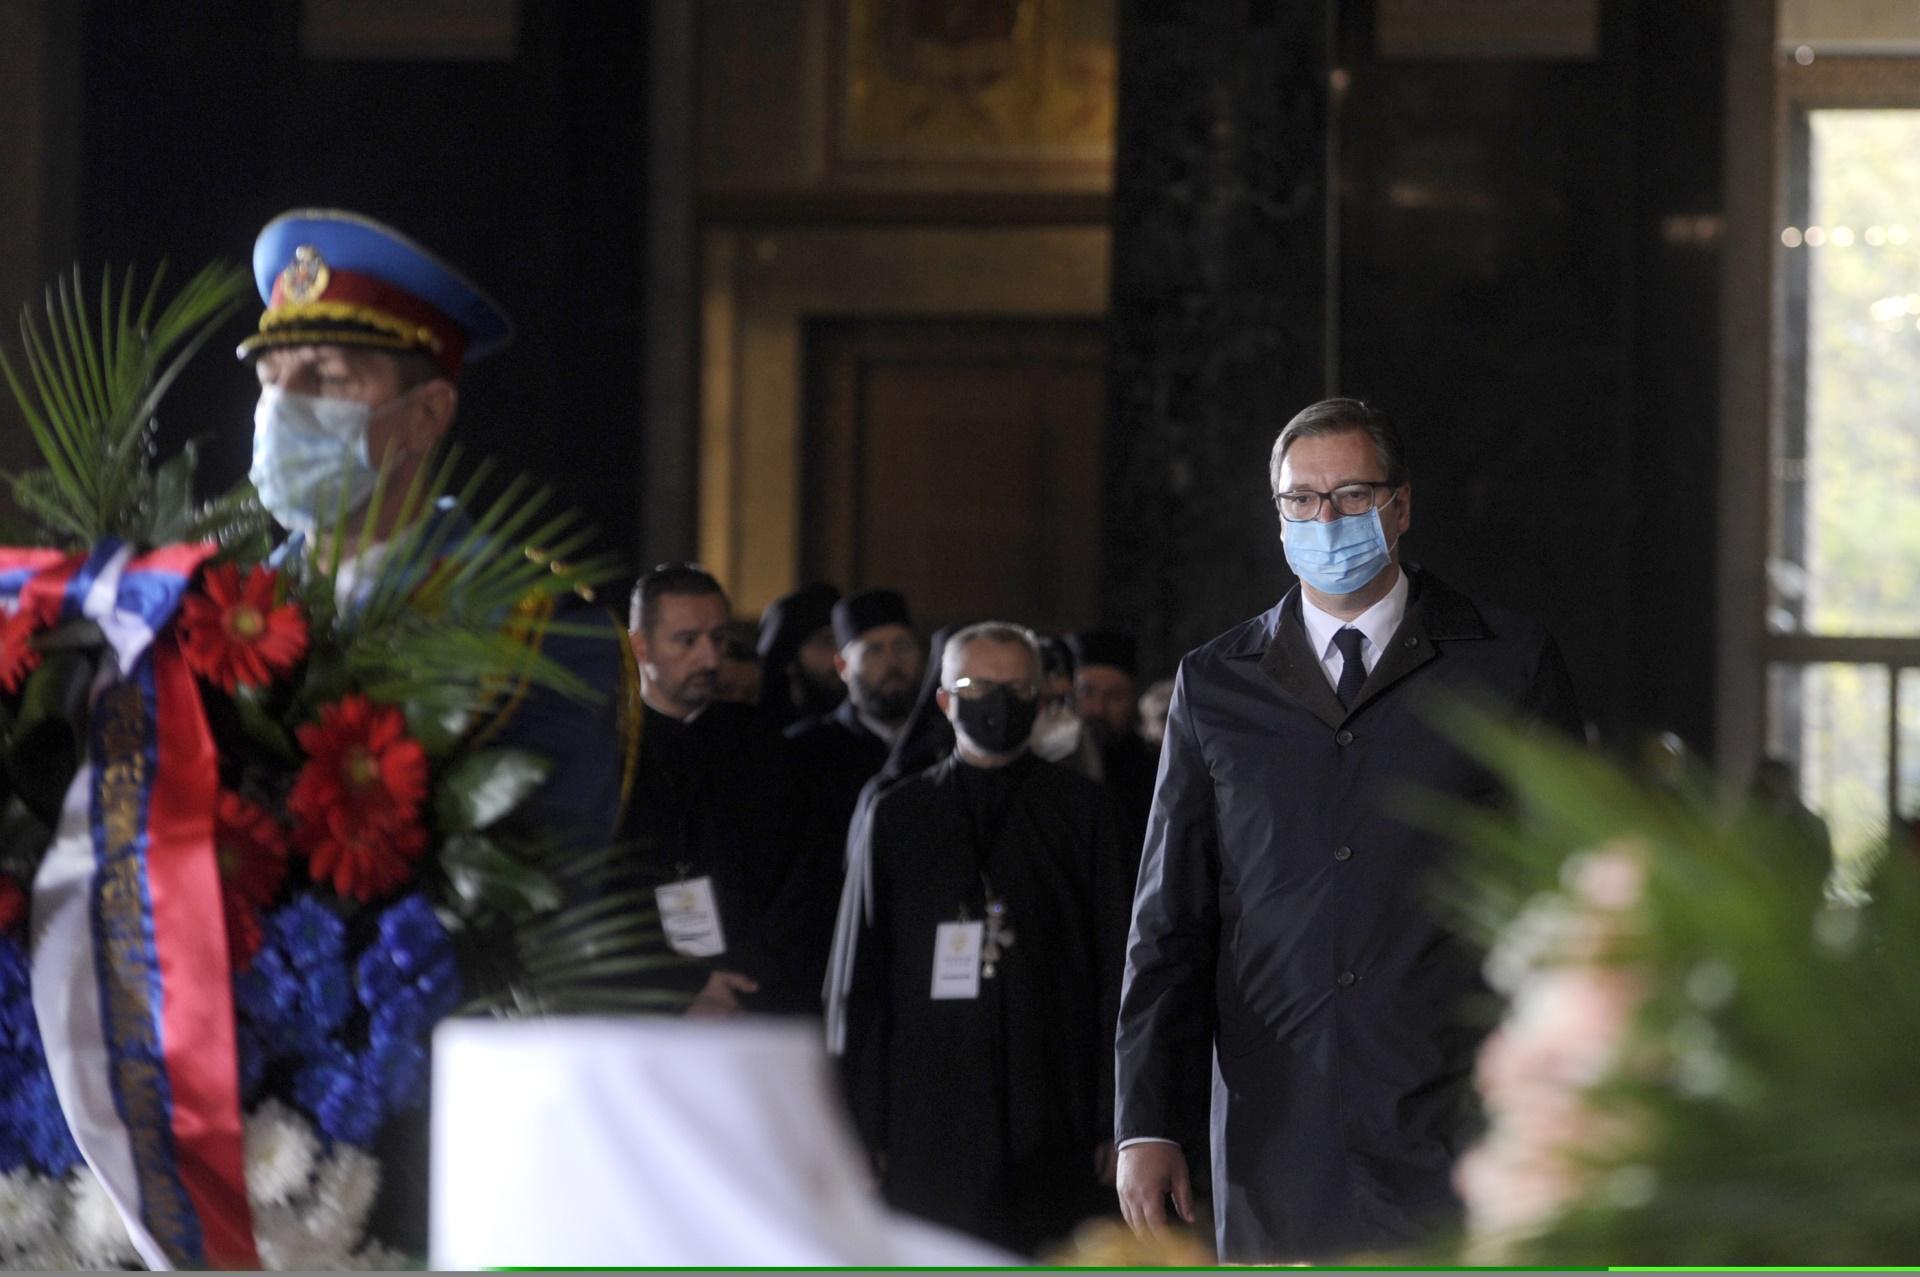 Predsednik Srbije Aleksandar Vucic Patrijarhova Srbija bila je Srbija mira i okupljanja